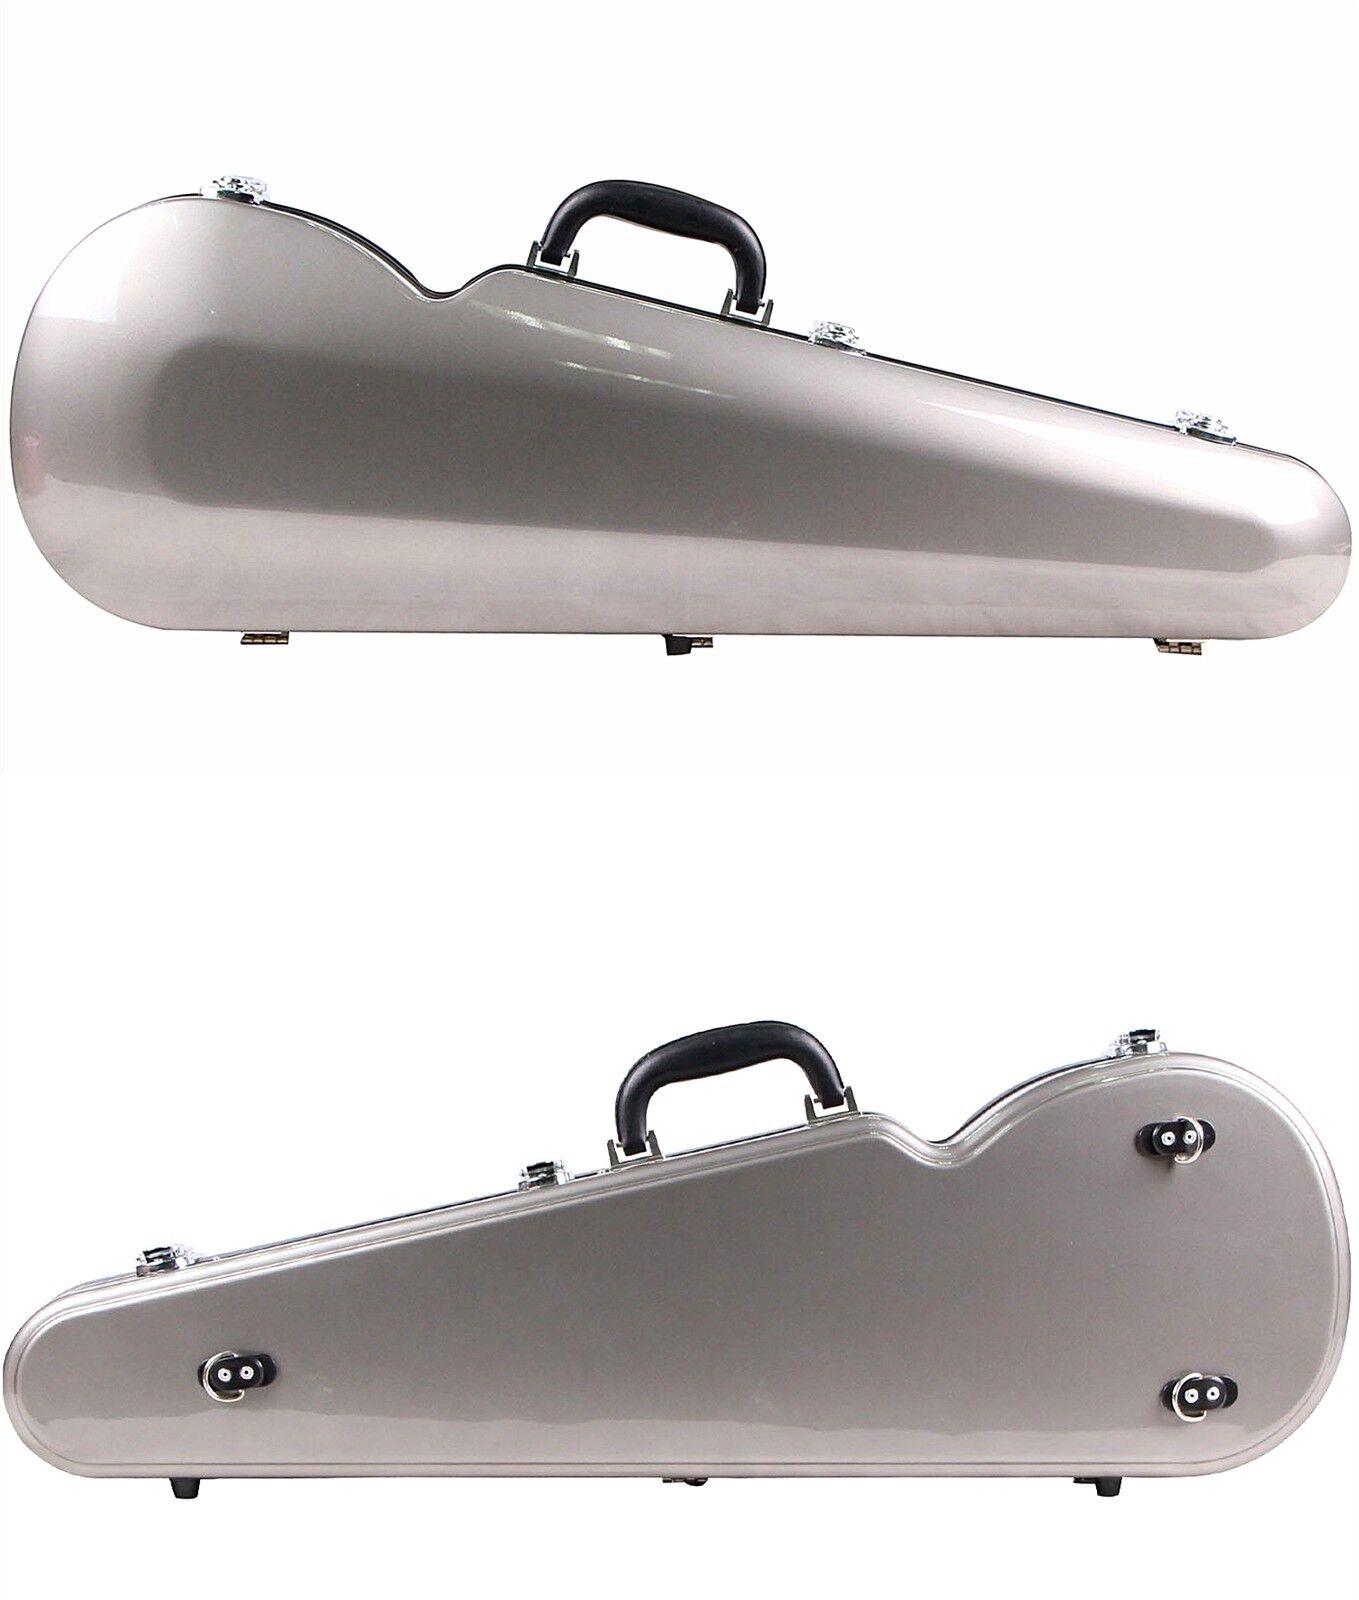 New Quality Fiberglass Violin Case 1 4 storlek, Same Day Shipping,US Seller